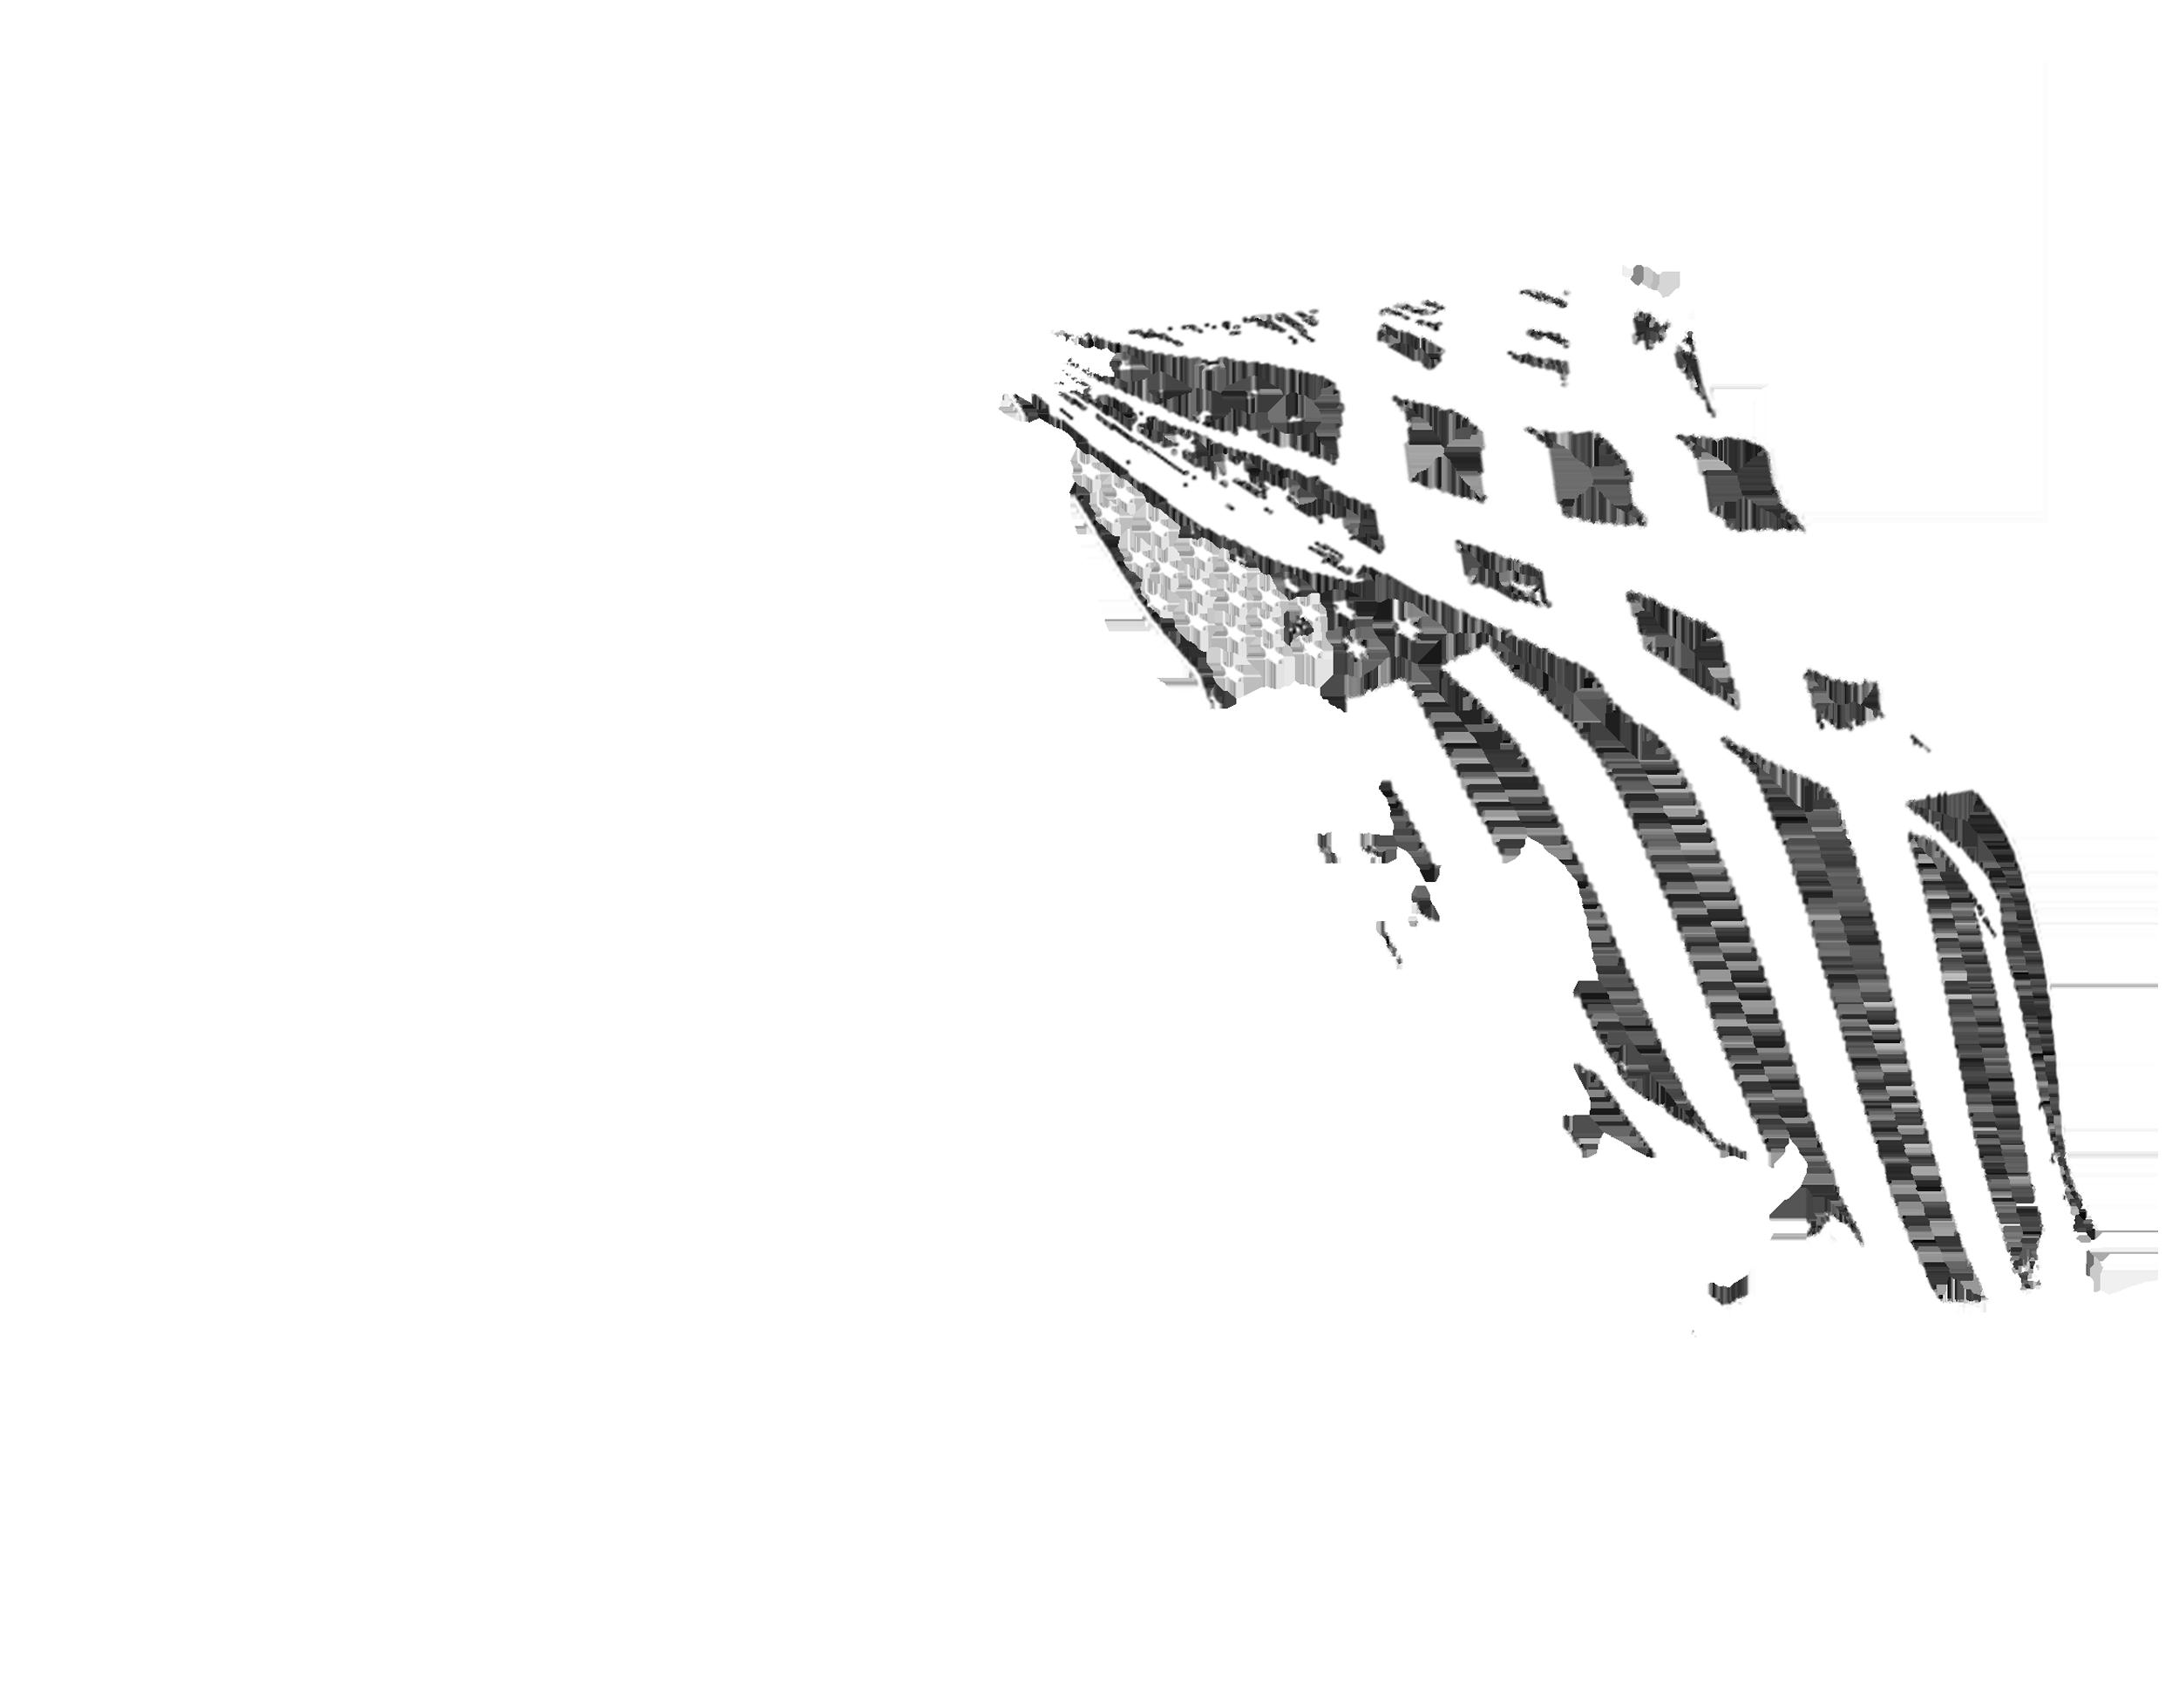 Create new Vietnam veteran t-shirt for Traveling Vietnam Wall events.